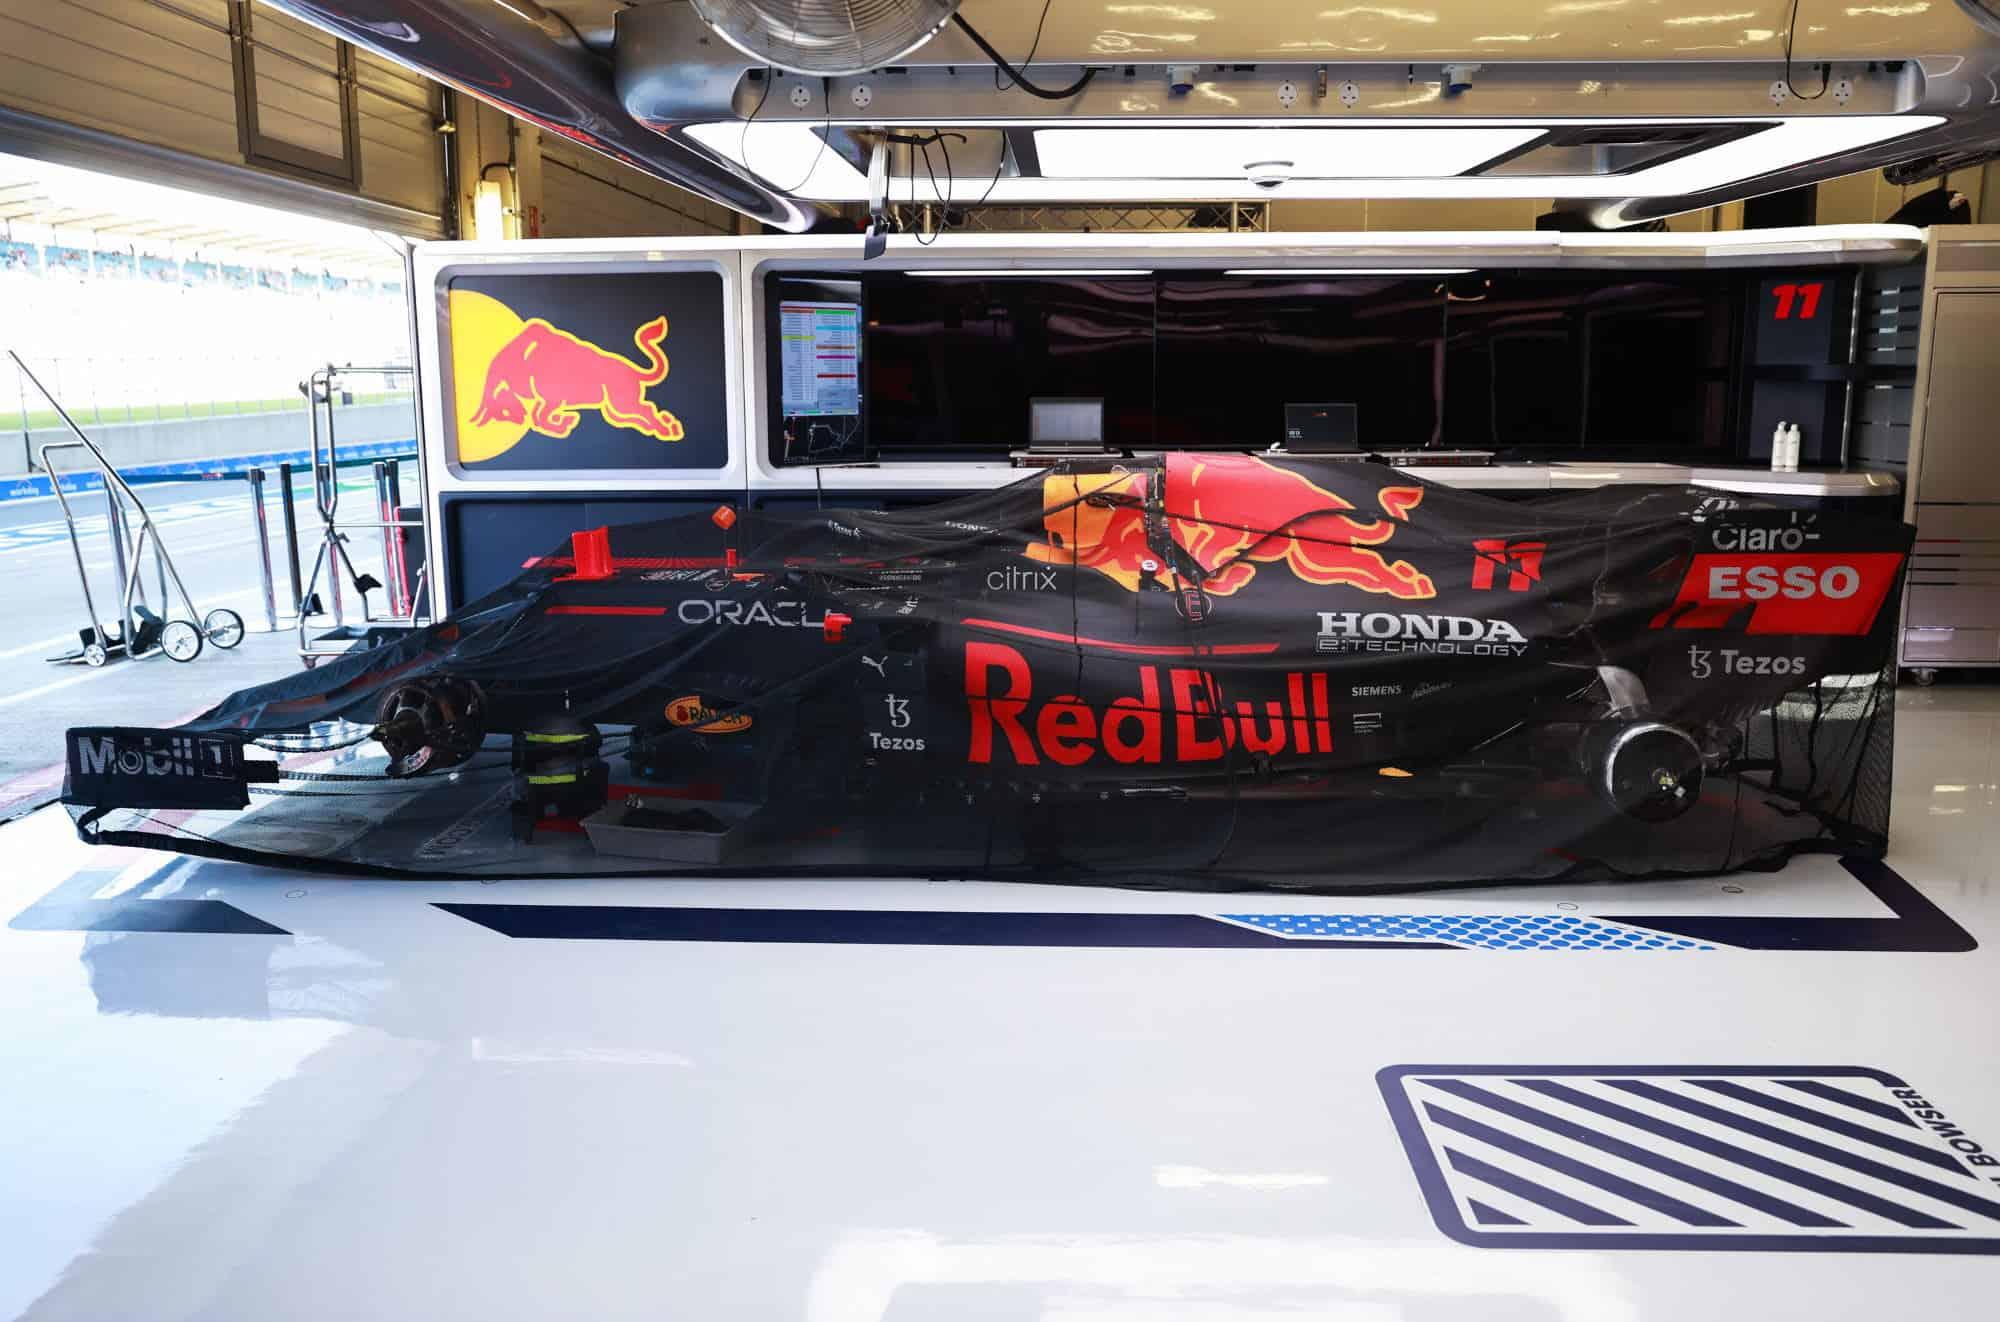 2021 British GP Perez Red Bull RB16B parc ferme garage Photo Red Bull